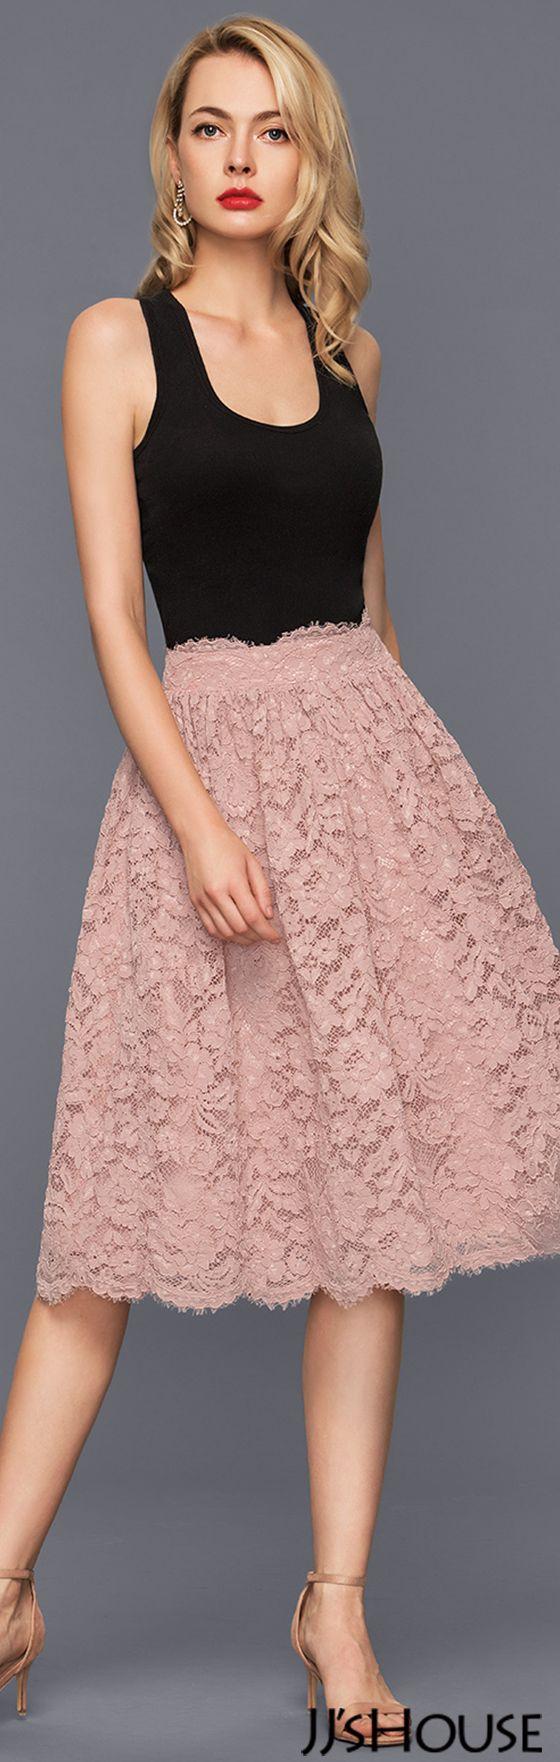 A-Line/Princess Knee-Length Lace Cocktail Dress#JJsHouse #Cocktail dresses